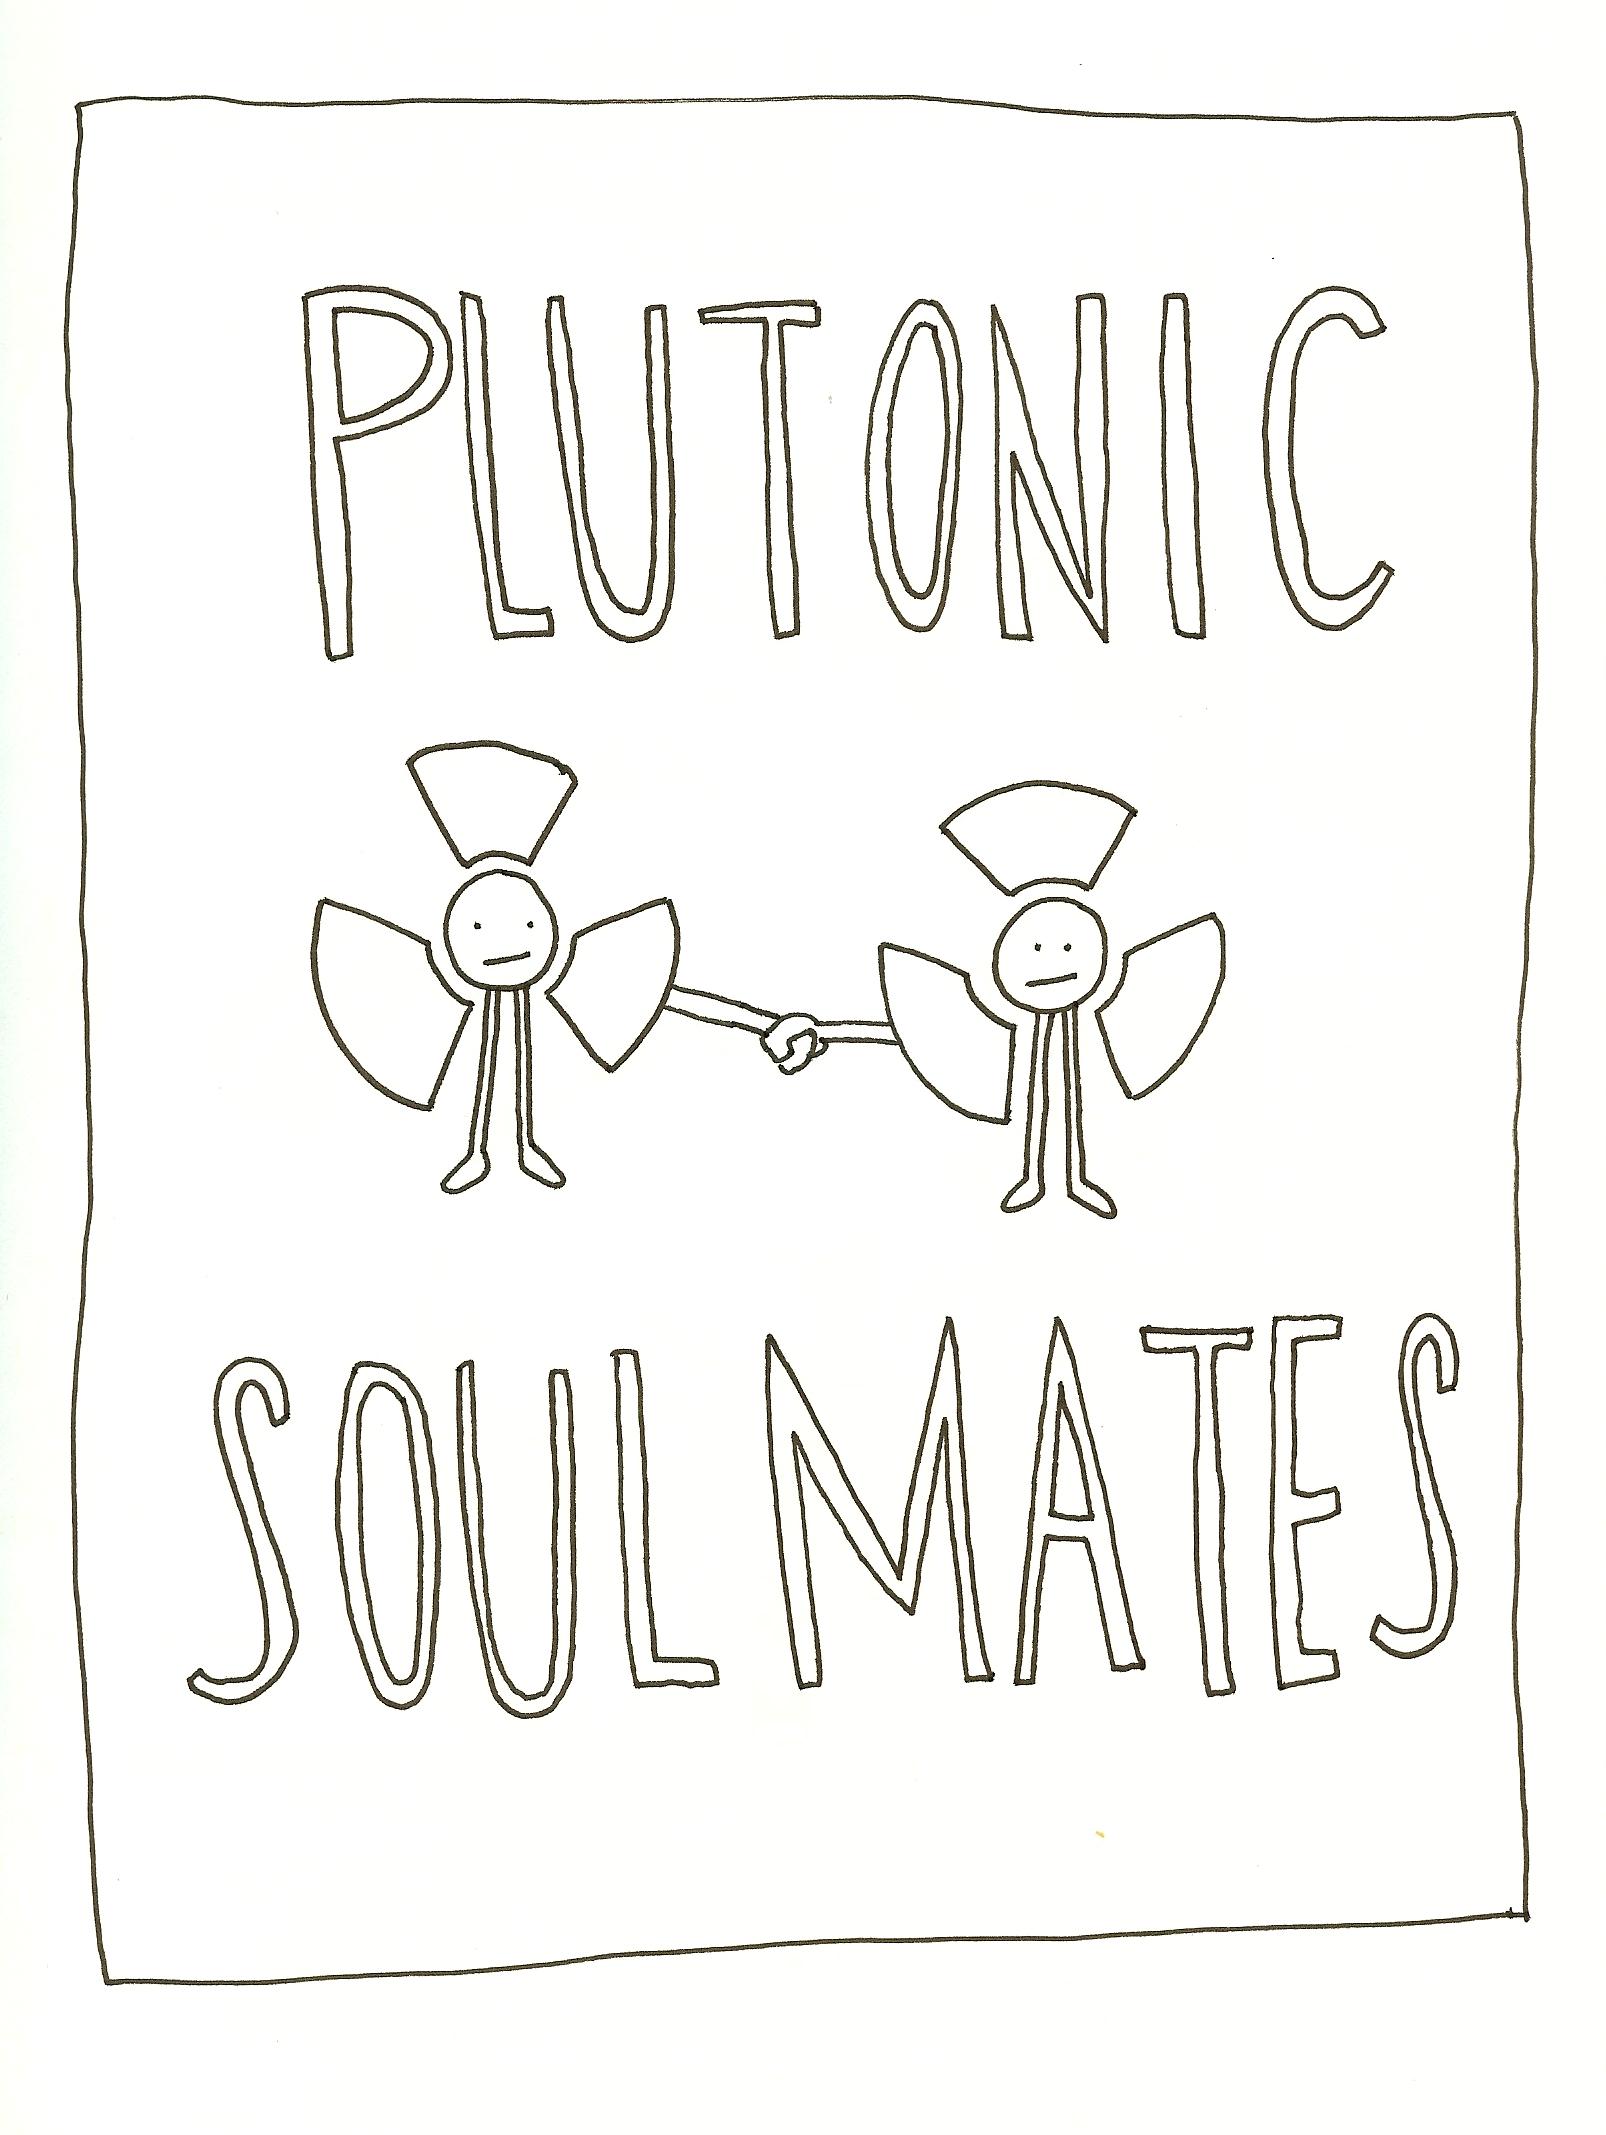 Plutonic Soulmates